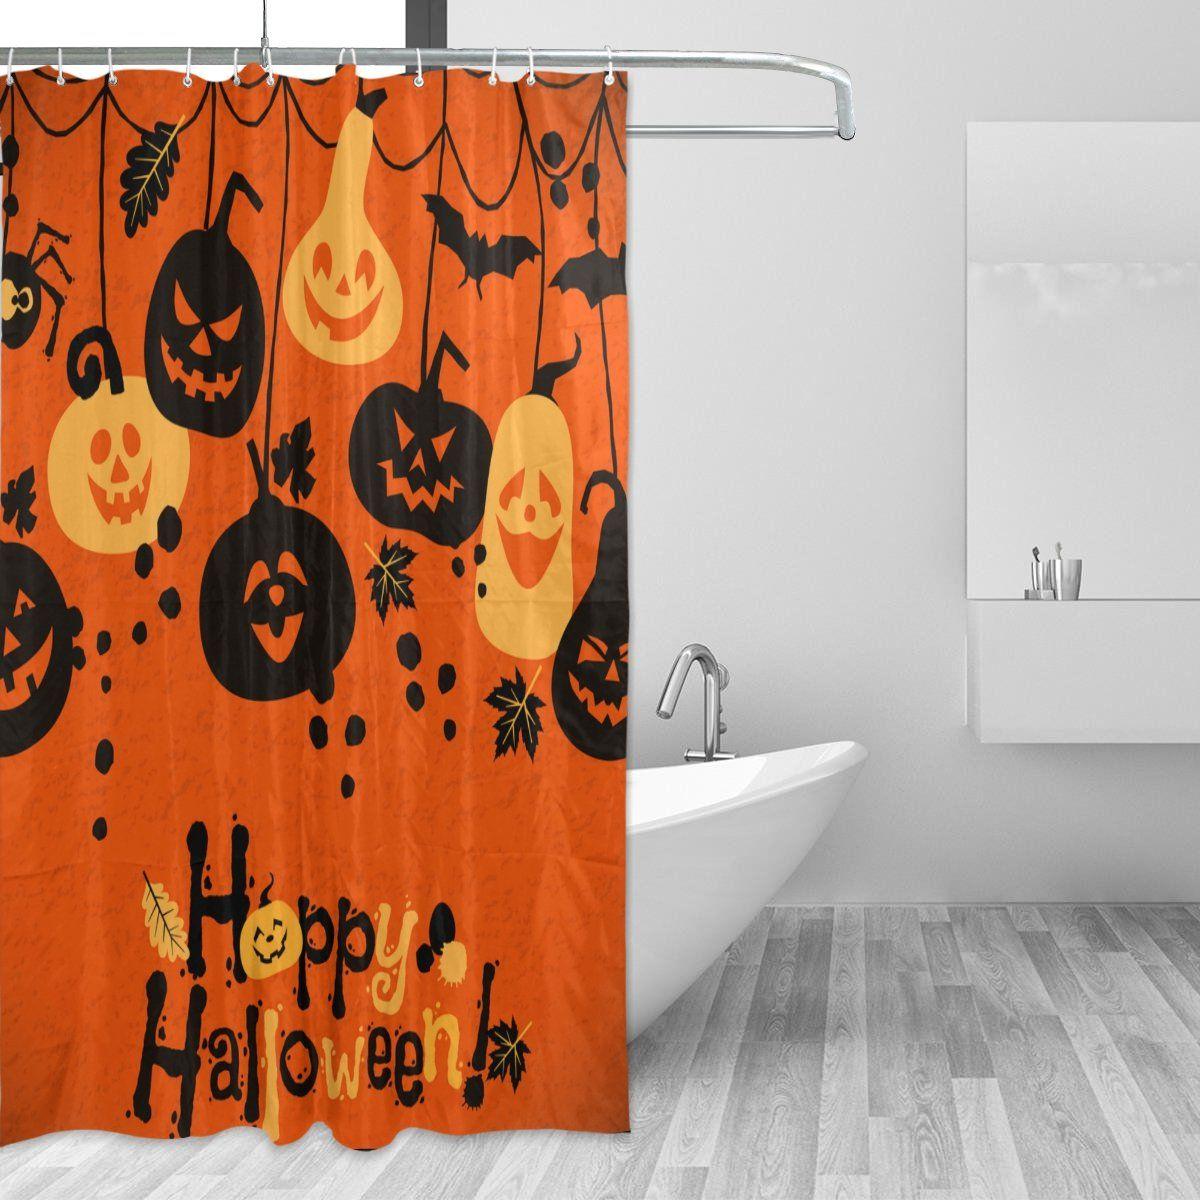 Vantaso Shower Curtains 72x72 Happy Halloween Hanging Pumpkin Bat